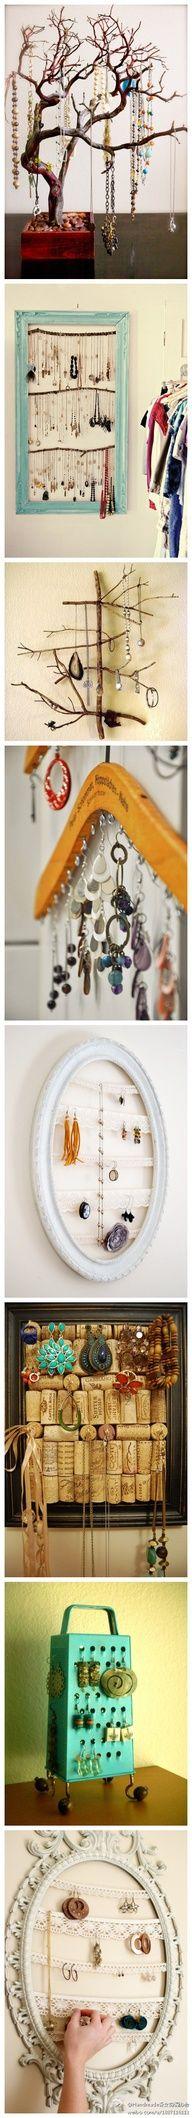 creative ways to organize your jewellery